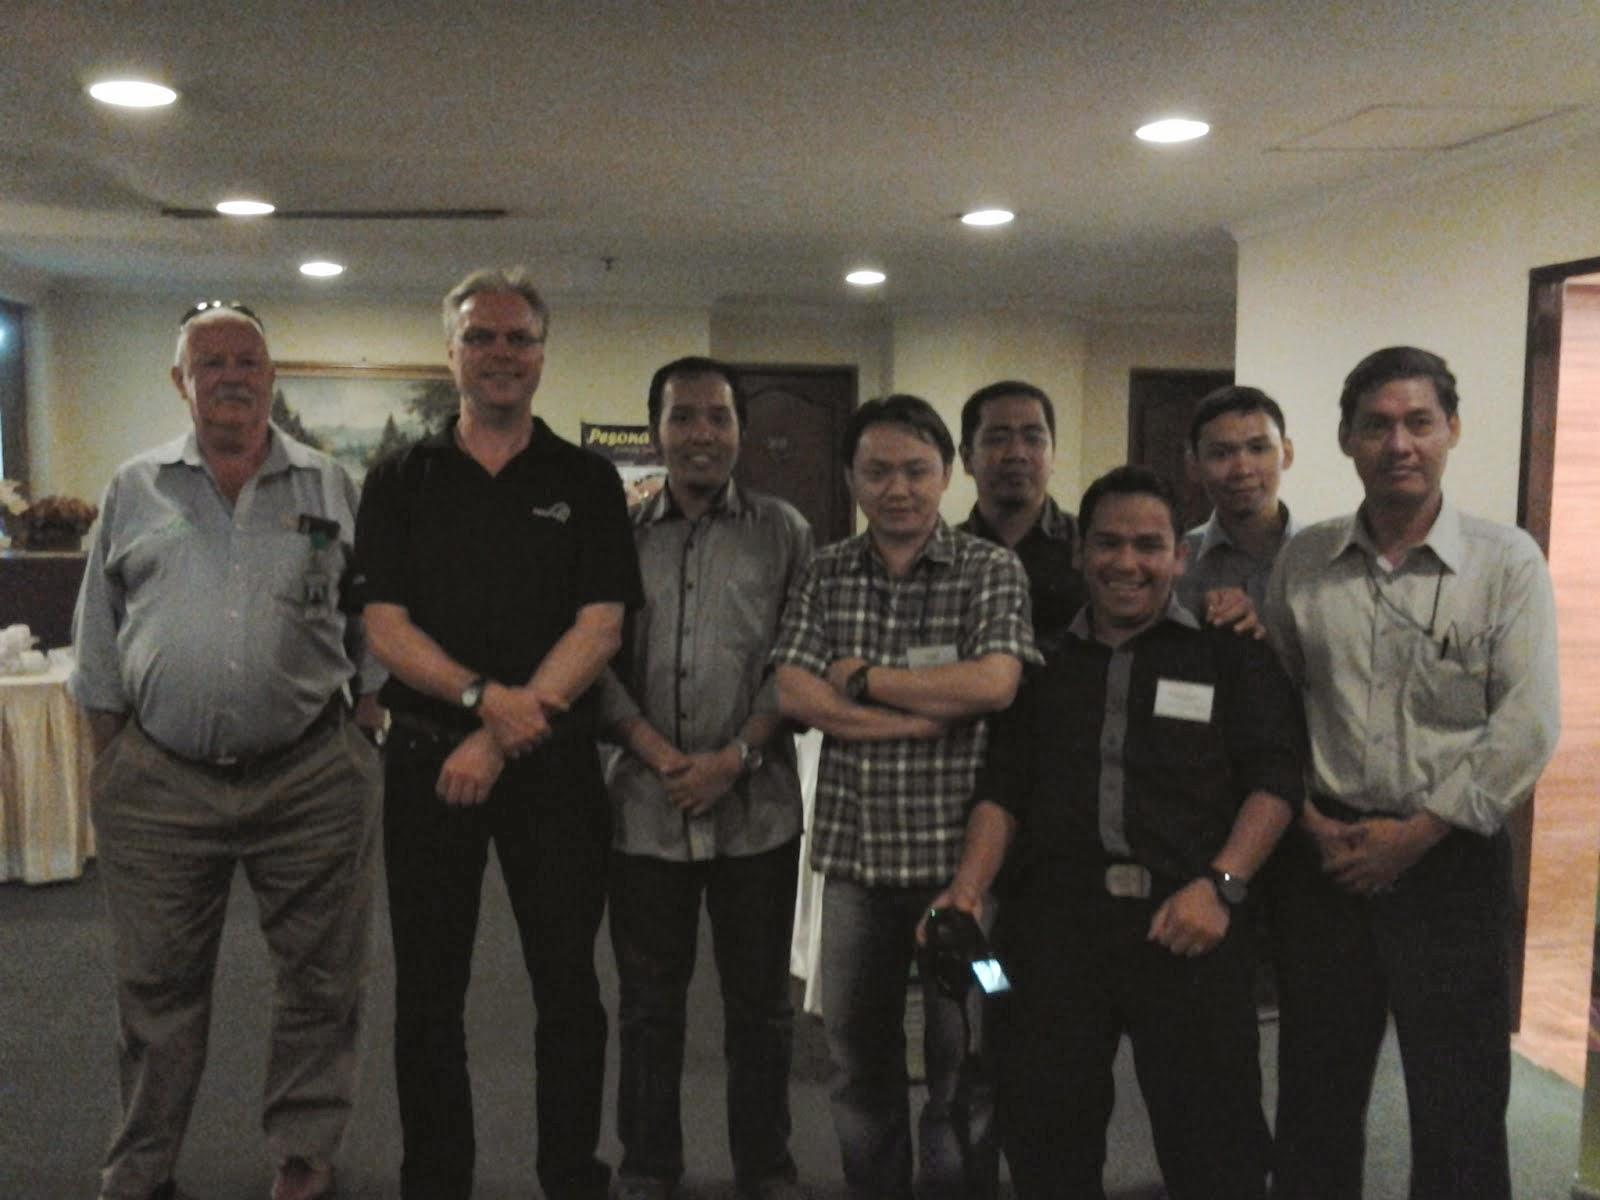 Presentasi Vulcan Mining Software V. 9 di Jakarta, Tanggal 12 Desember 2013